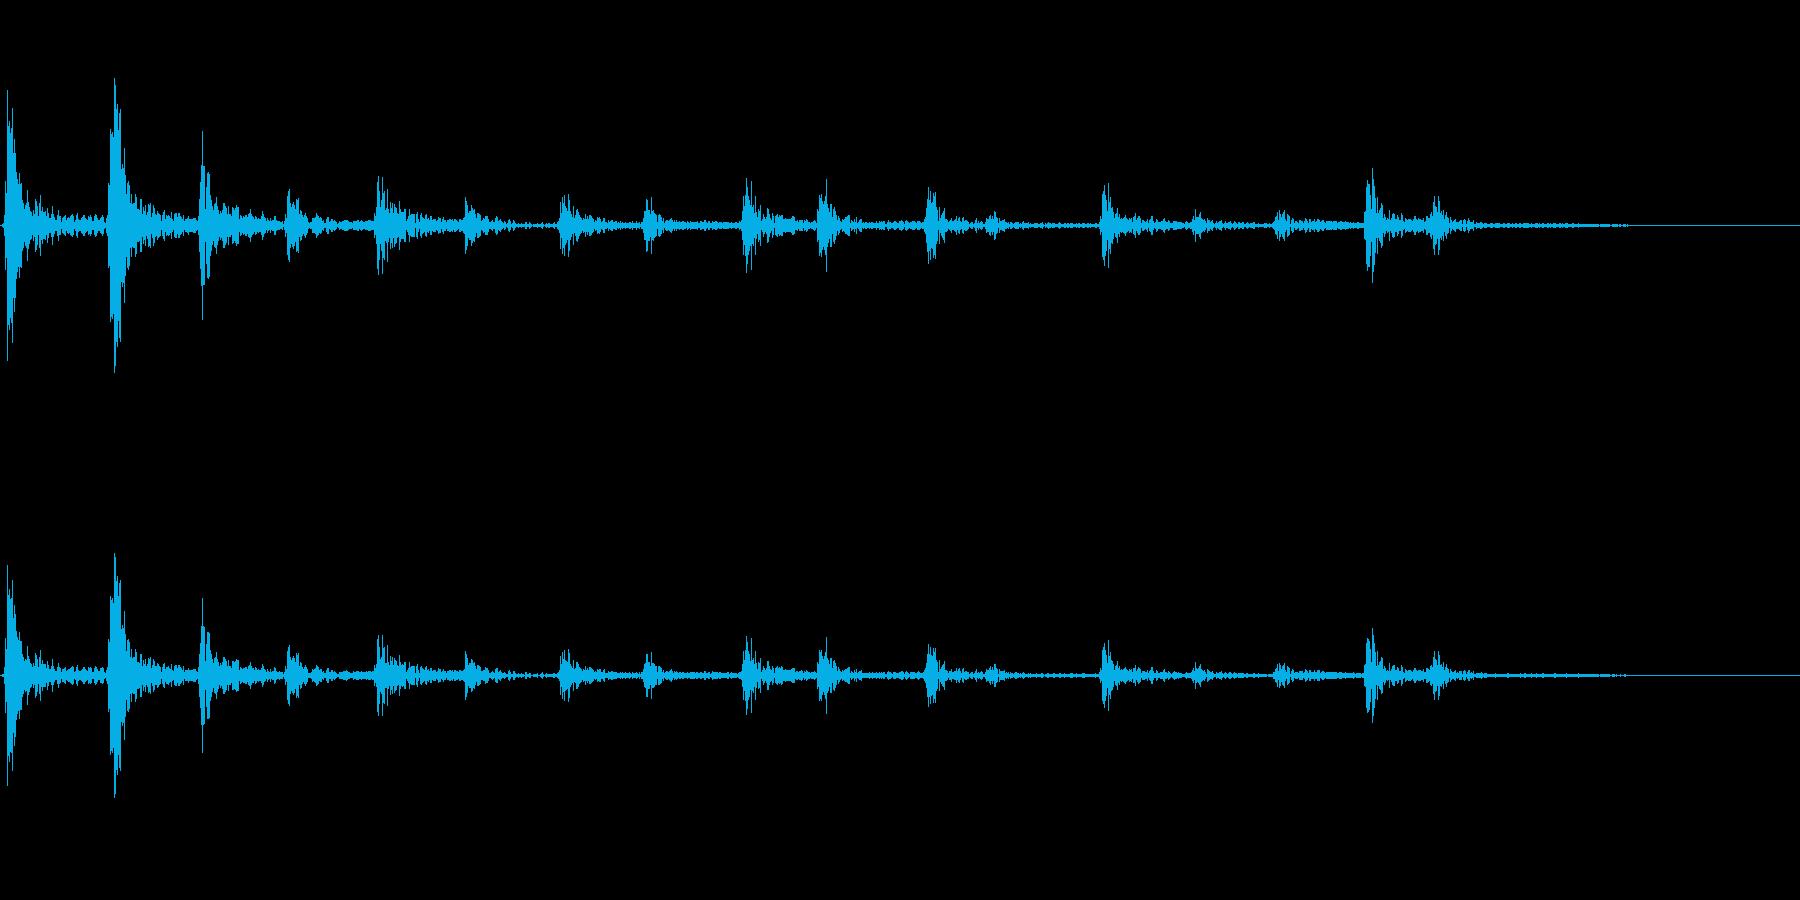 【SE 効果音】パーカッションの再生済みの波形